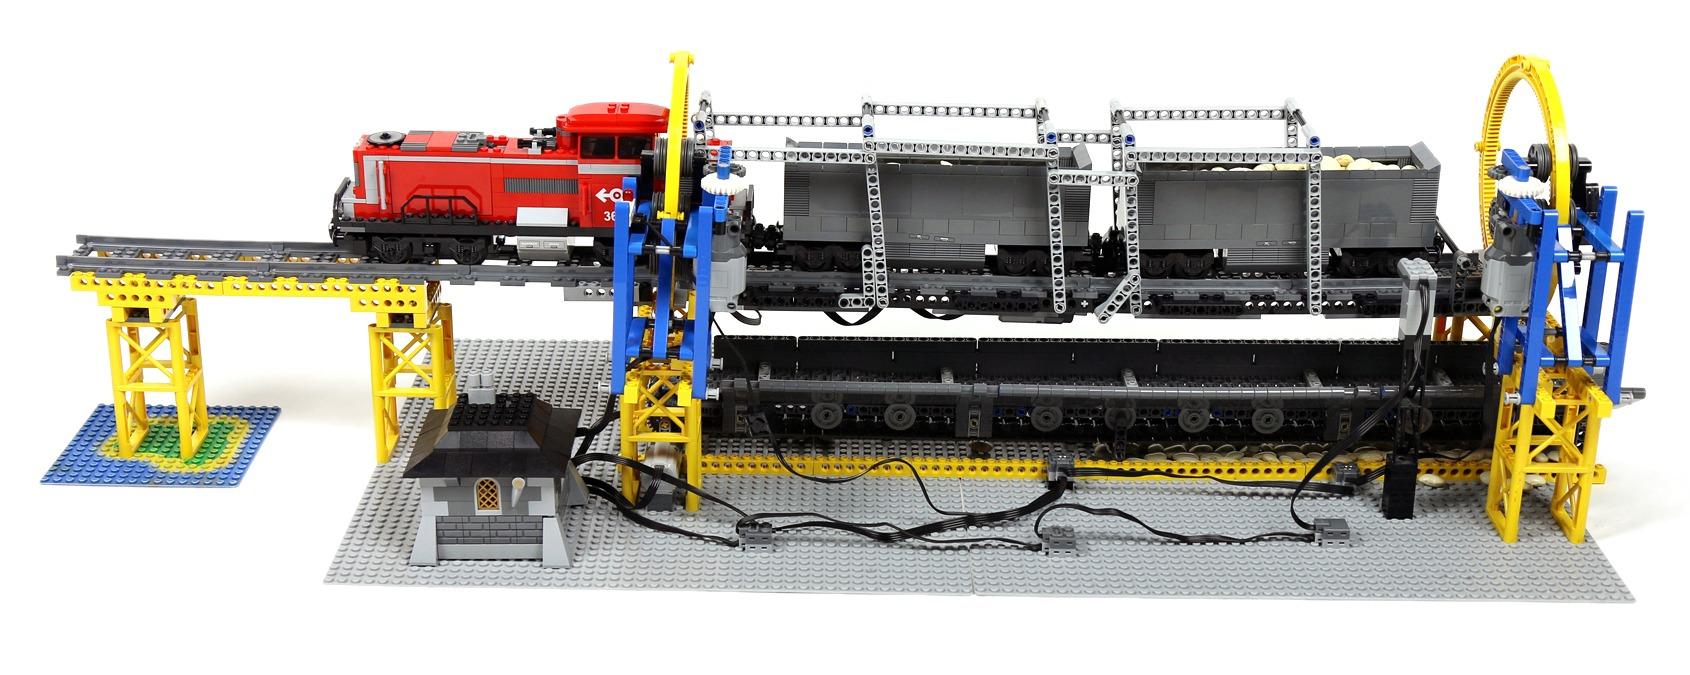 lego-train-rotary-dumper-02